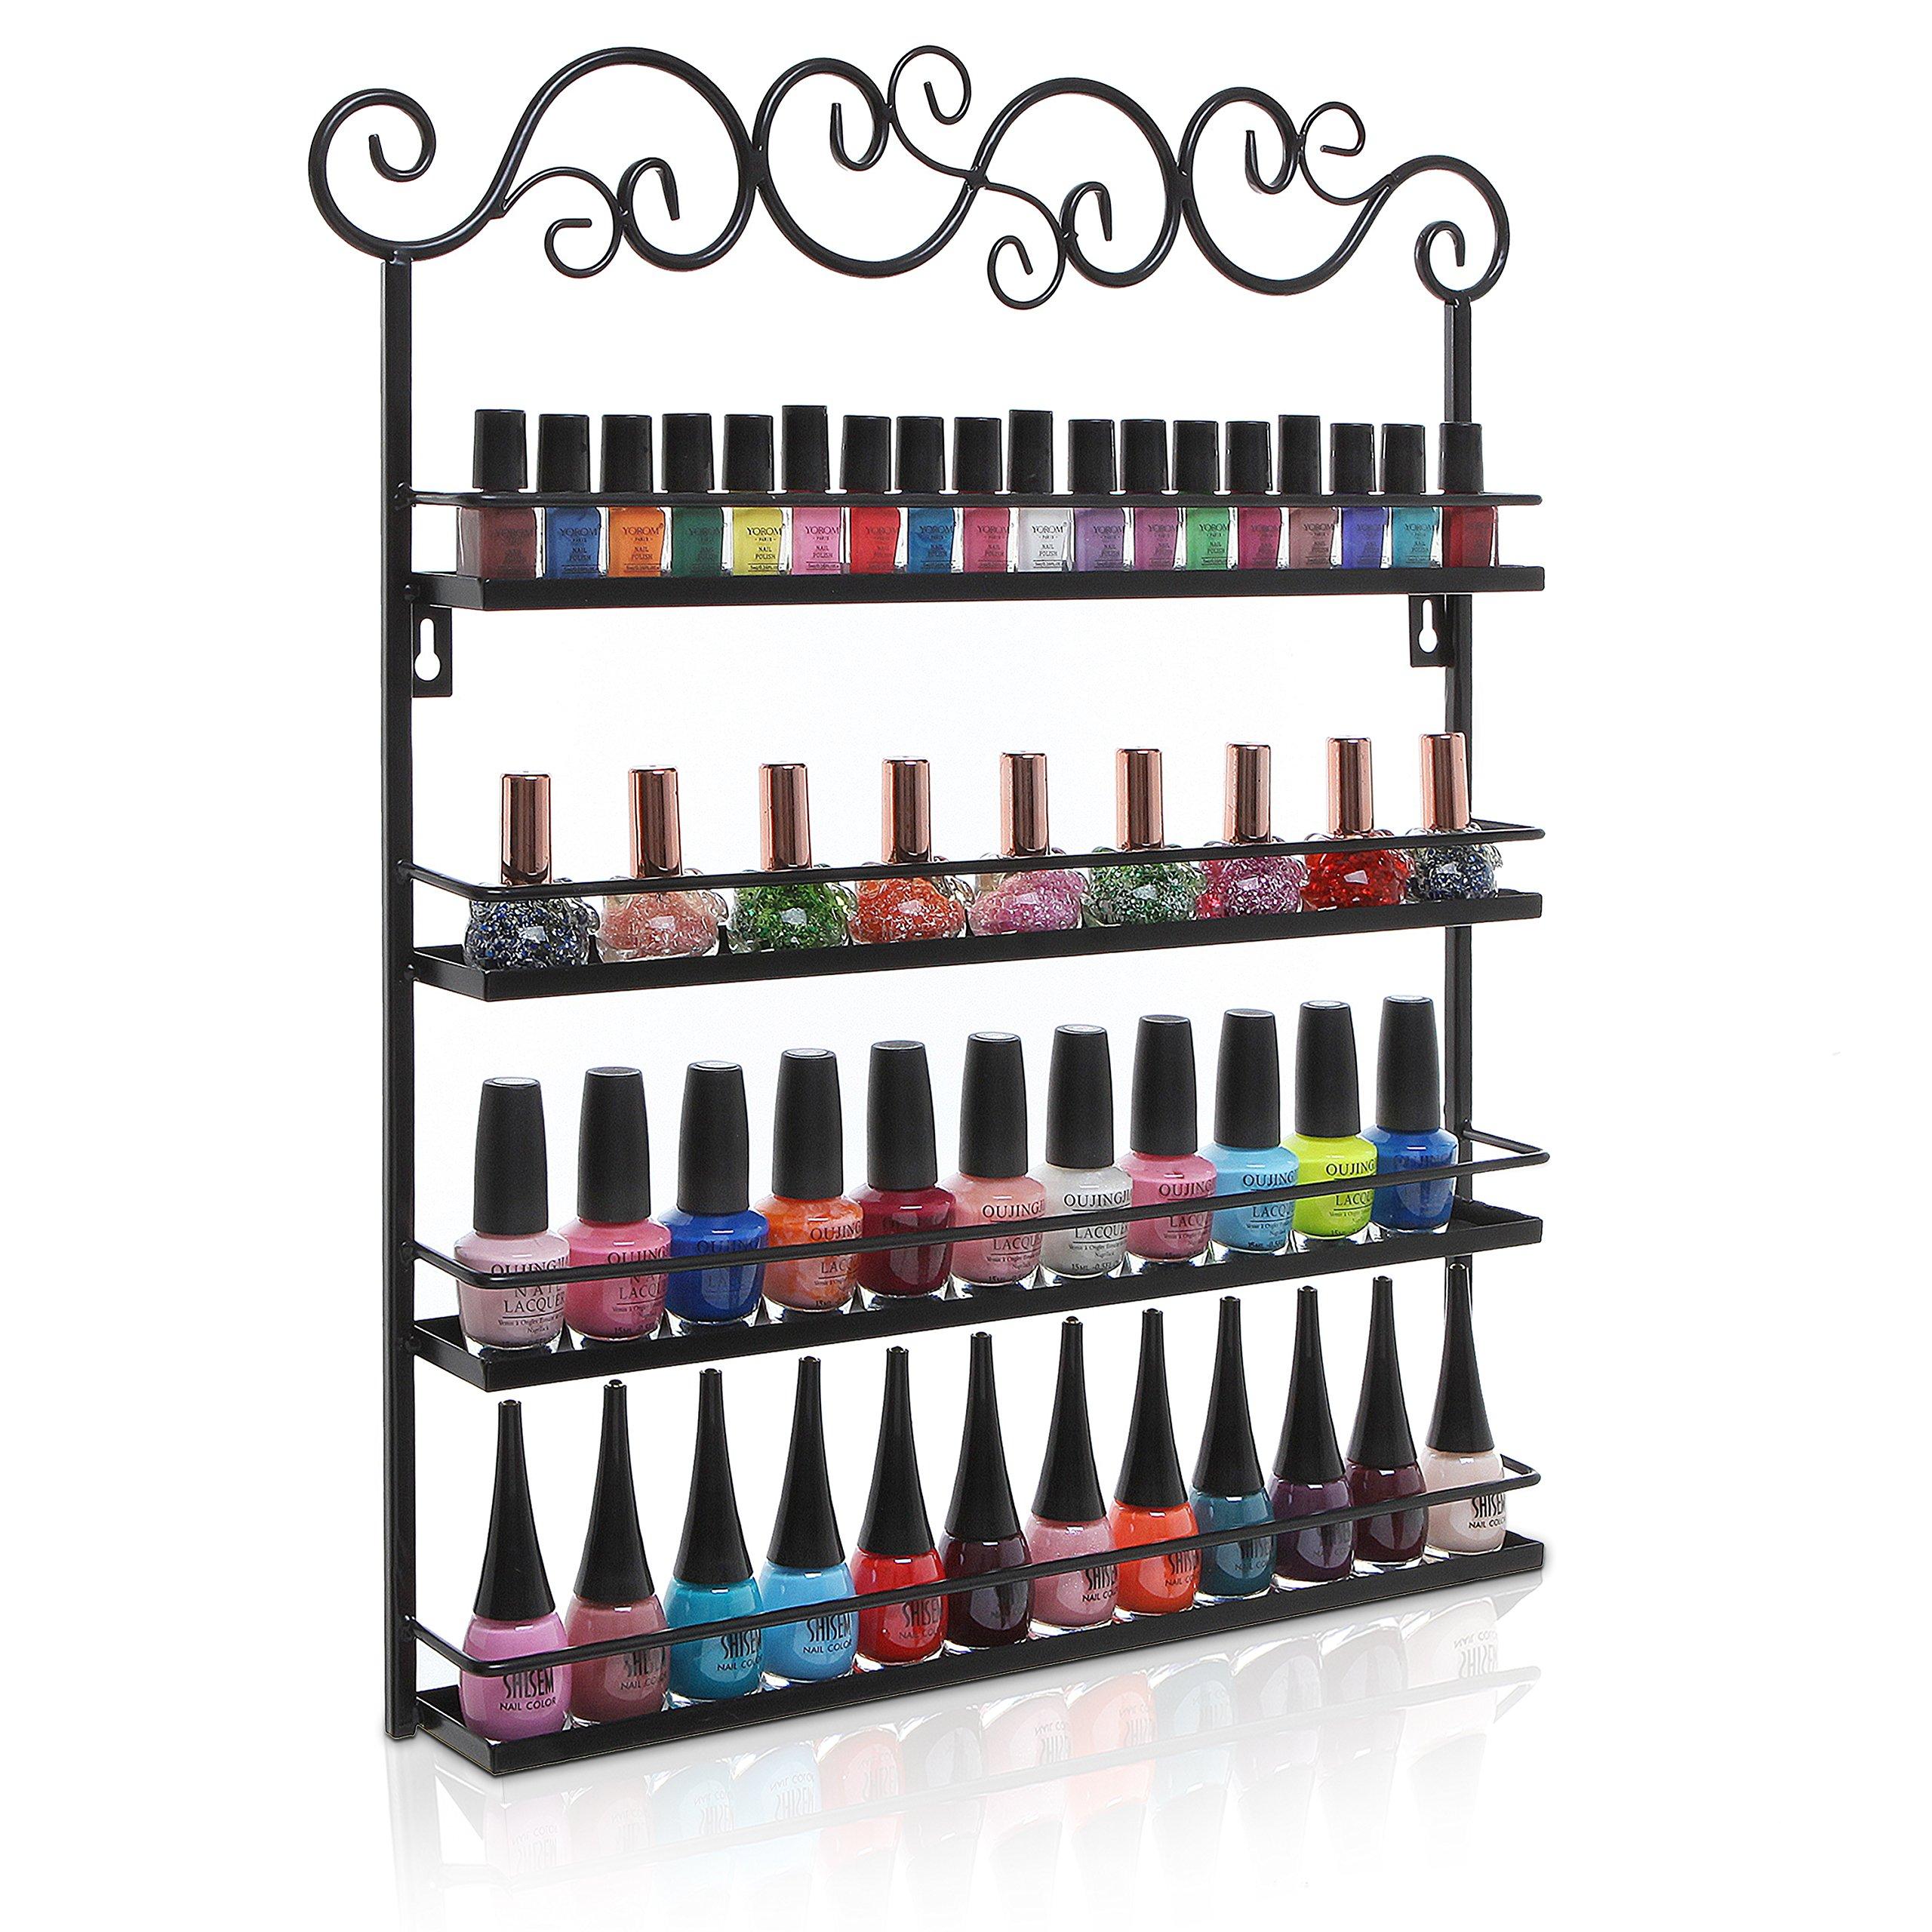 Black Metal Wall Mounted 4 Shelf Nail Salon Polish Rack / Makeup Cosmetics Storage Organizer Shelves